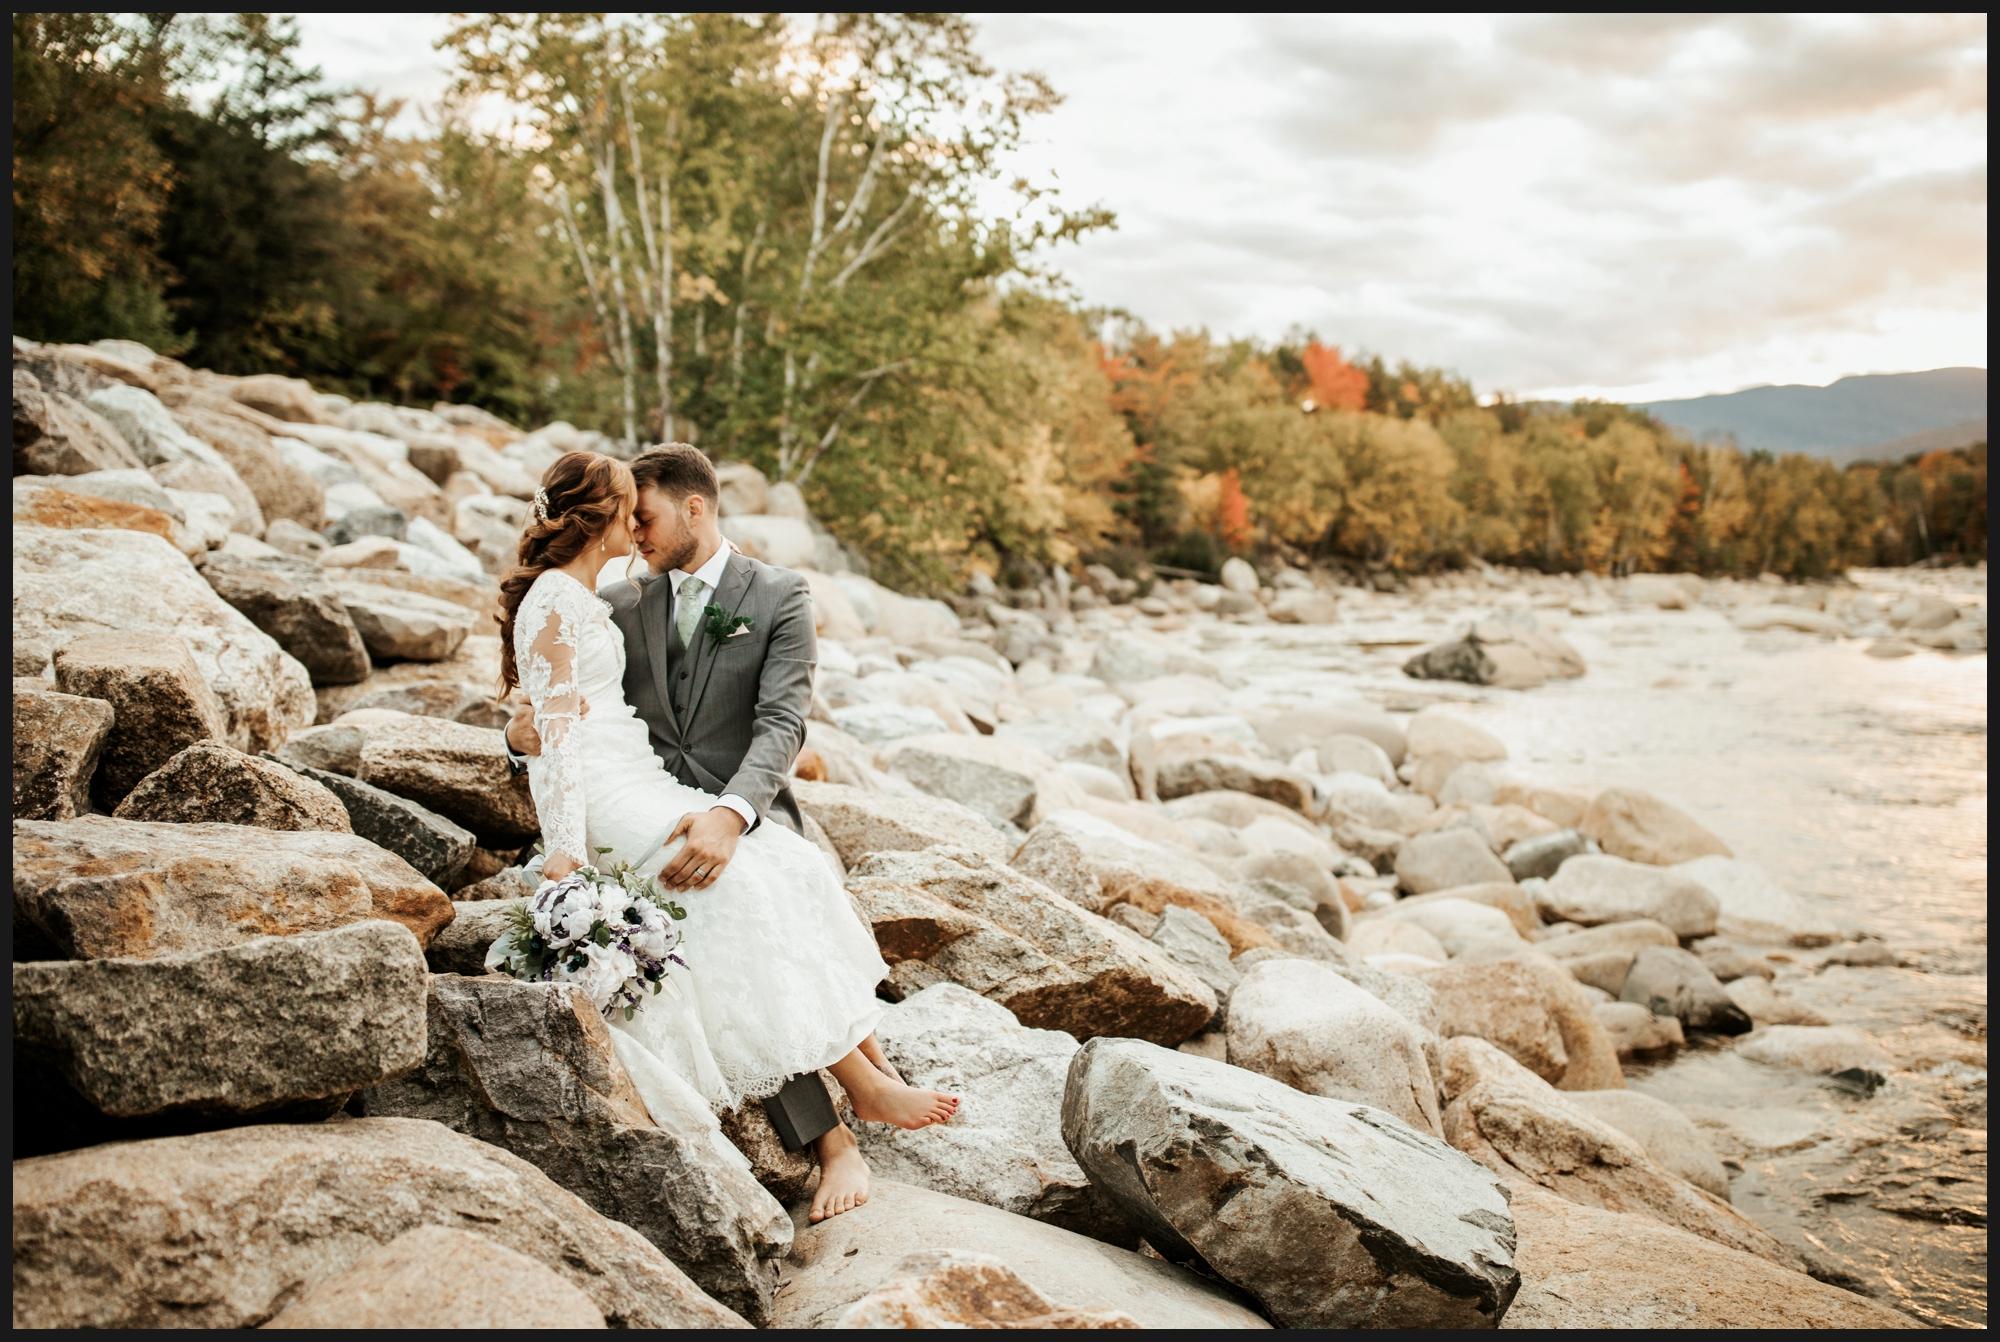 Orlando-Wedding-Photographer-destination-wedding-photographer-florida-wedding-photographer-hawaii-wedding-photographer_0162.jpg